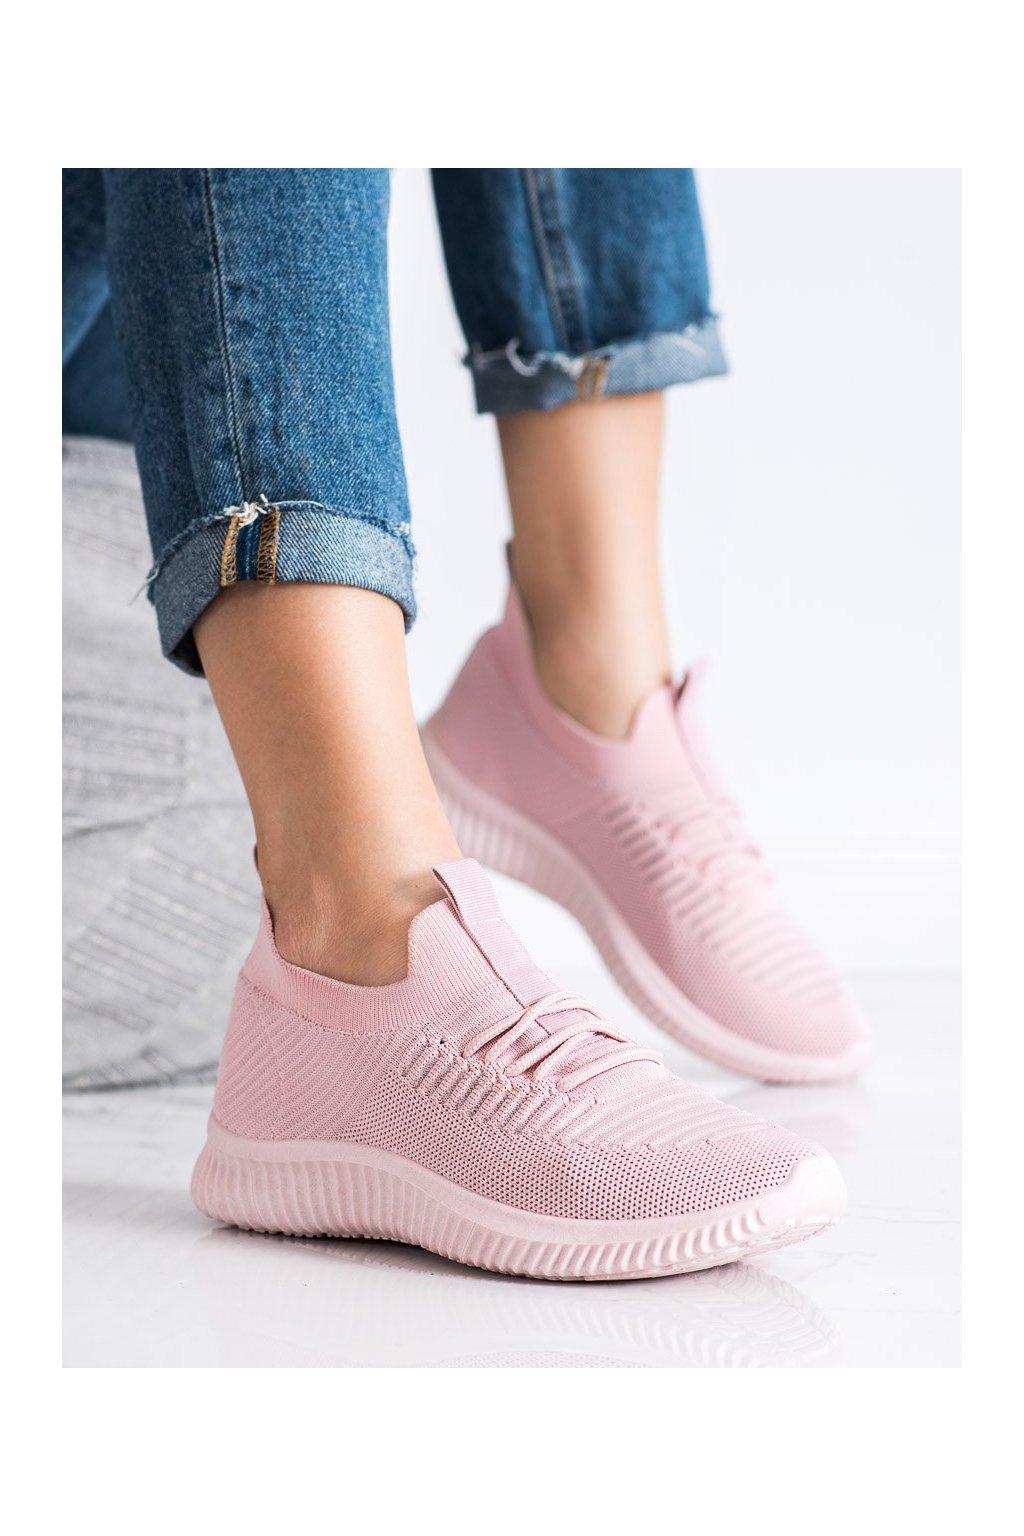 Ružové tenisky Mckeylor kod ANH21-13532P